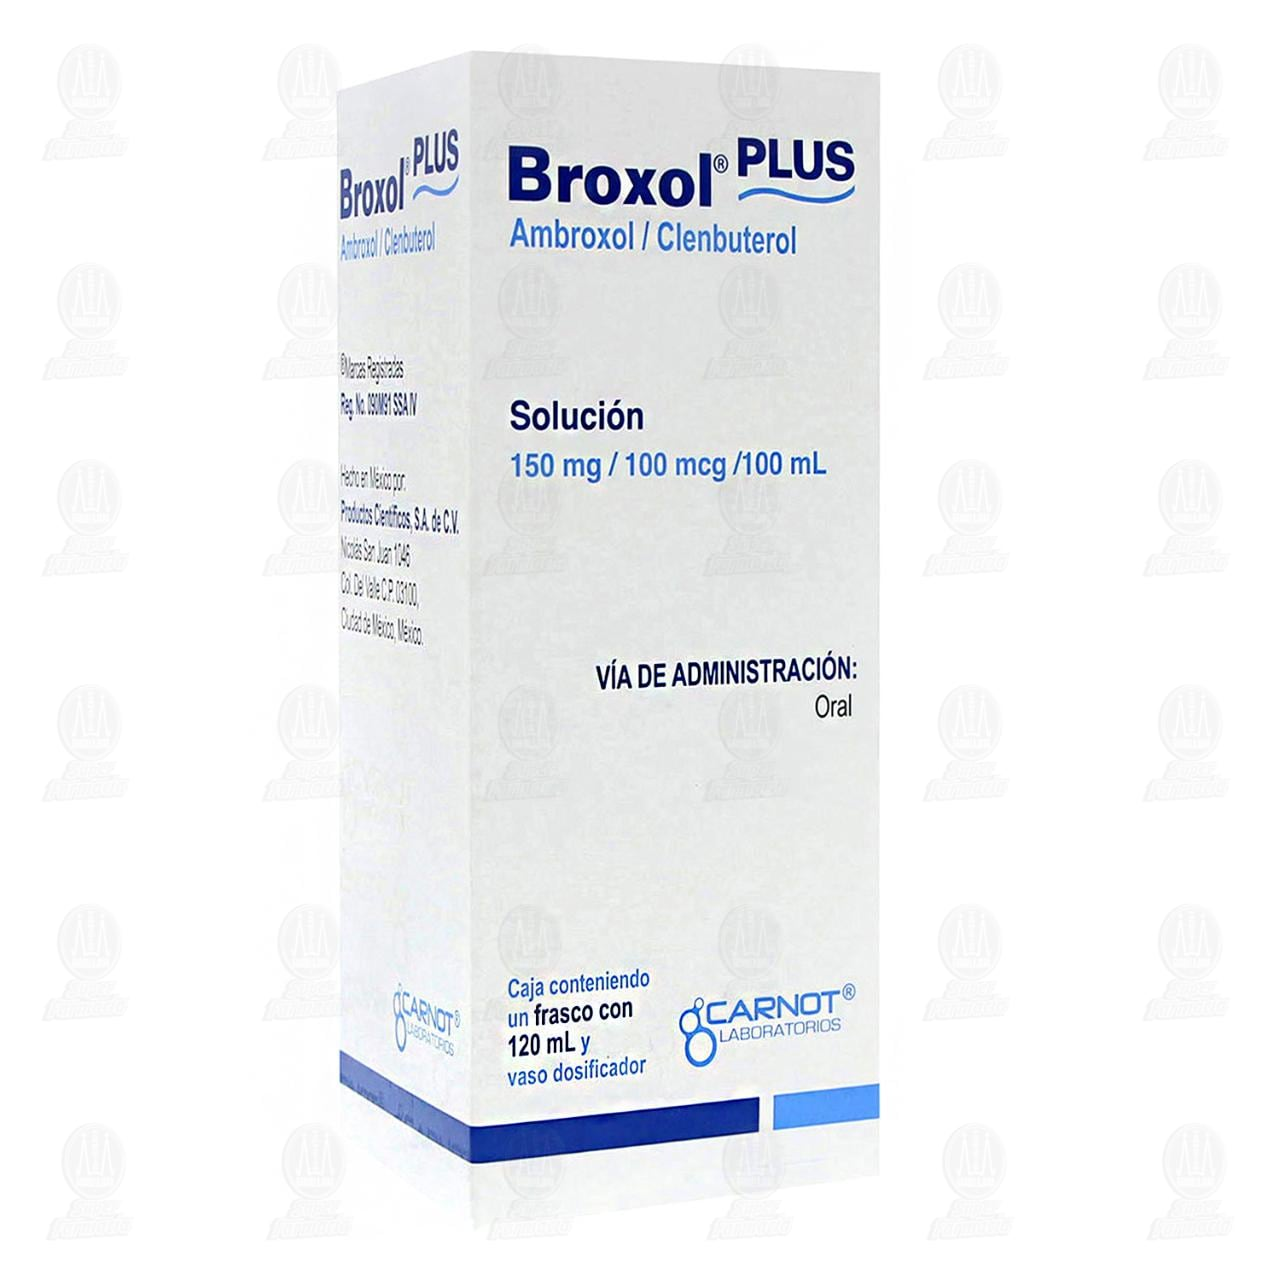 Comprar Broxol Plus 150mg/100mcg/100ml 120ml en Farmacias Guadalajara